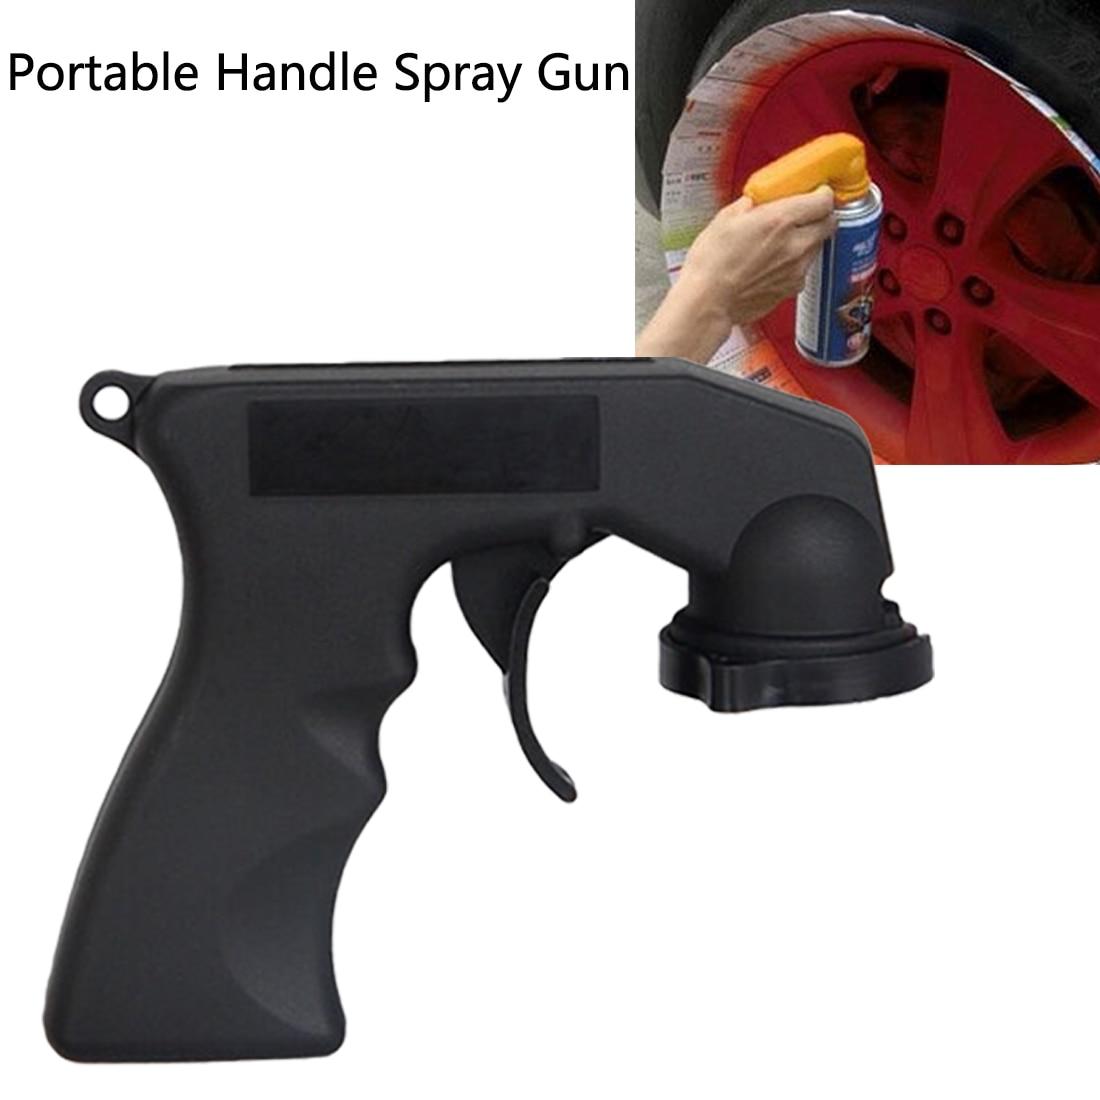 PP Material Spray Gun Handle Tools With Full Grip Trigger Locking Collar Car Maintenance 1pc Spray Adaptor Paint Care Aerosol